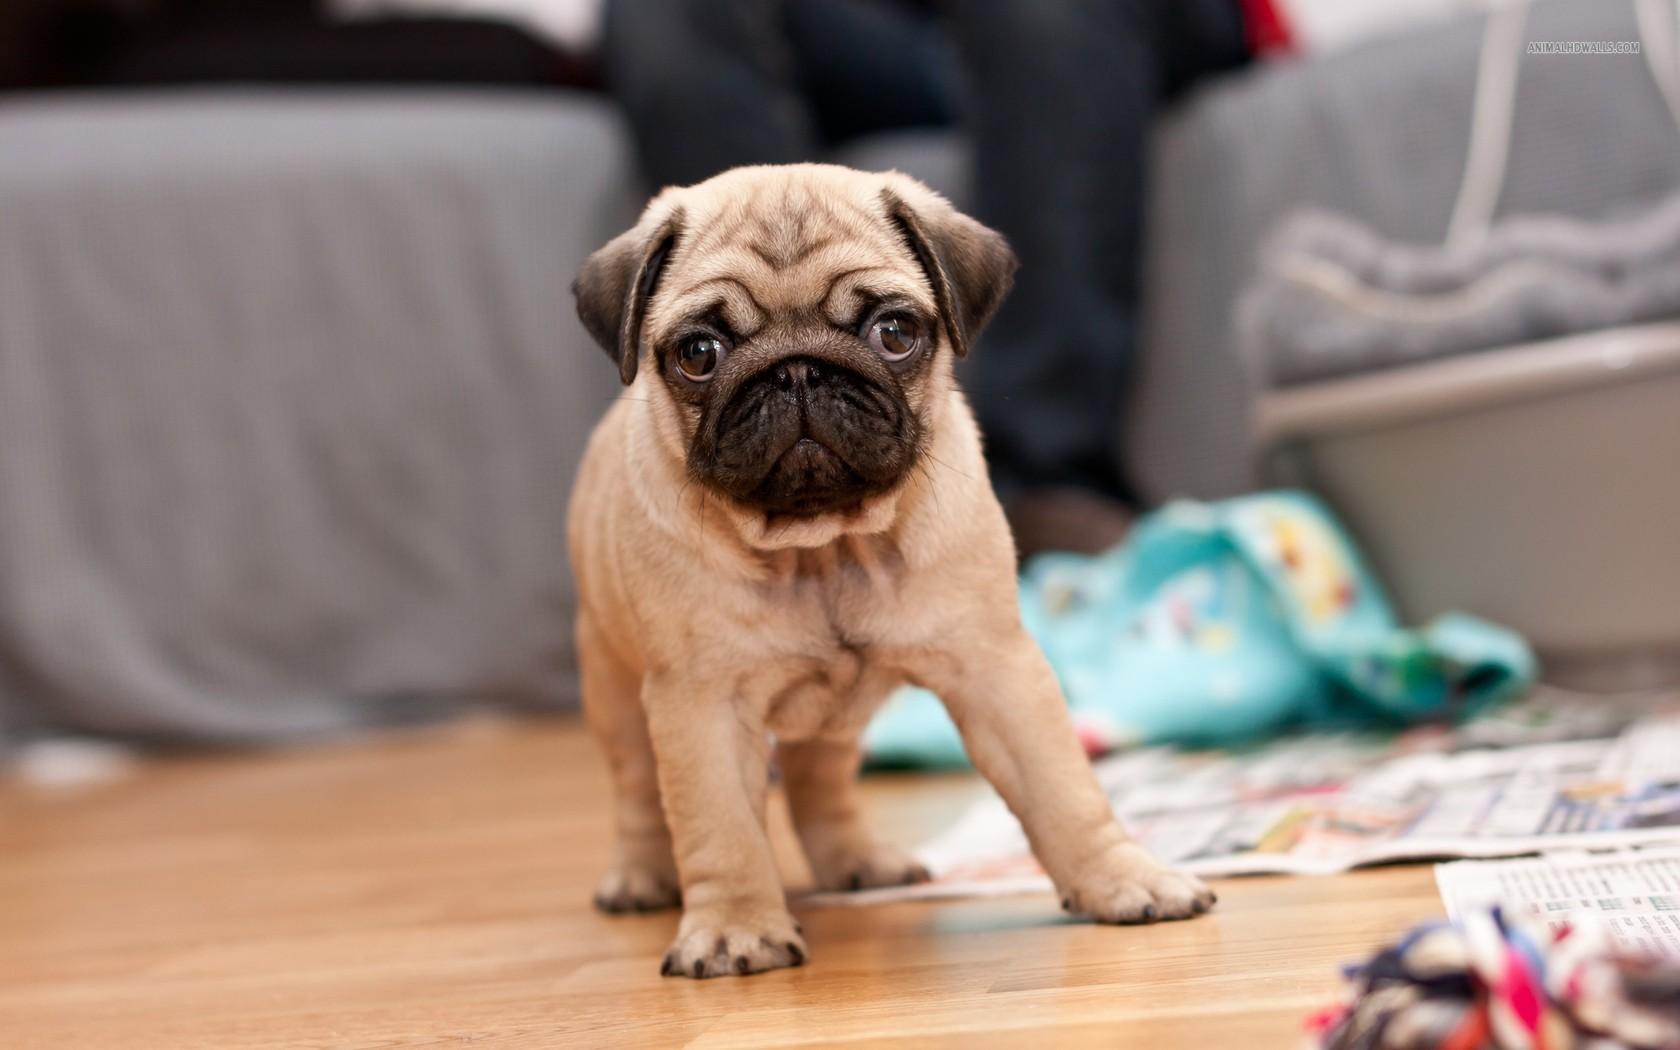 Pug Puppy Wallpaper - WallpaperSafari